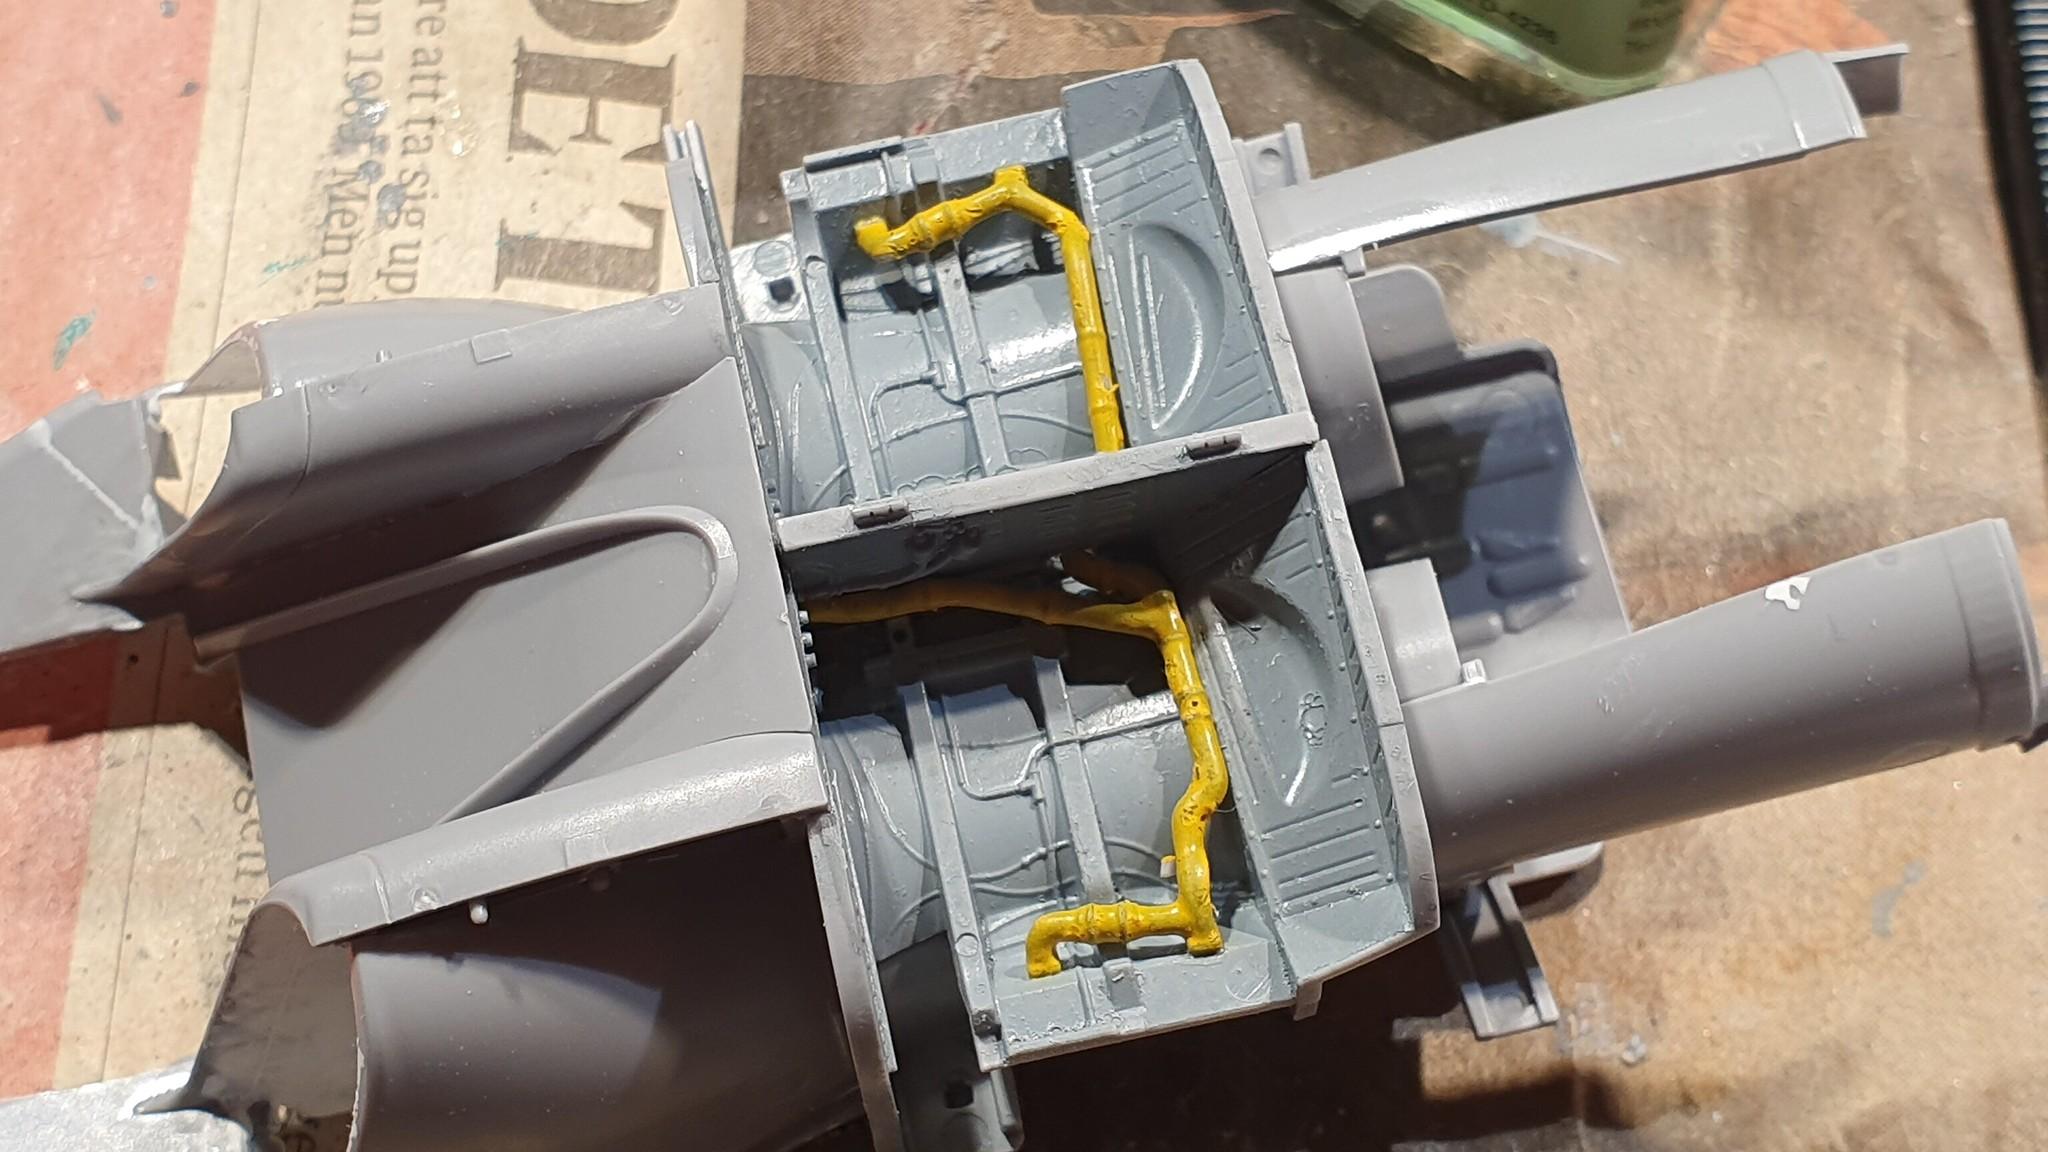 Numera två par tumvantar - Yak-130 Mitten - Zvezda 1/48 - Sida 10 49236853201_4a64c82613_k